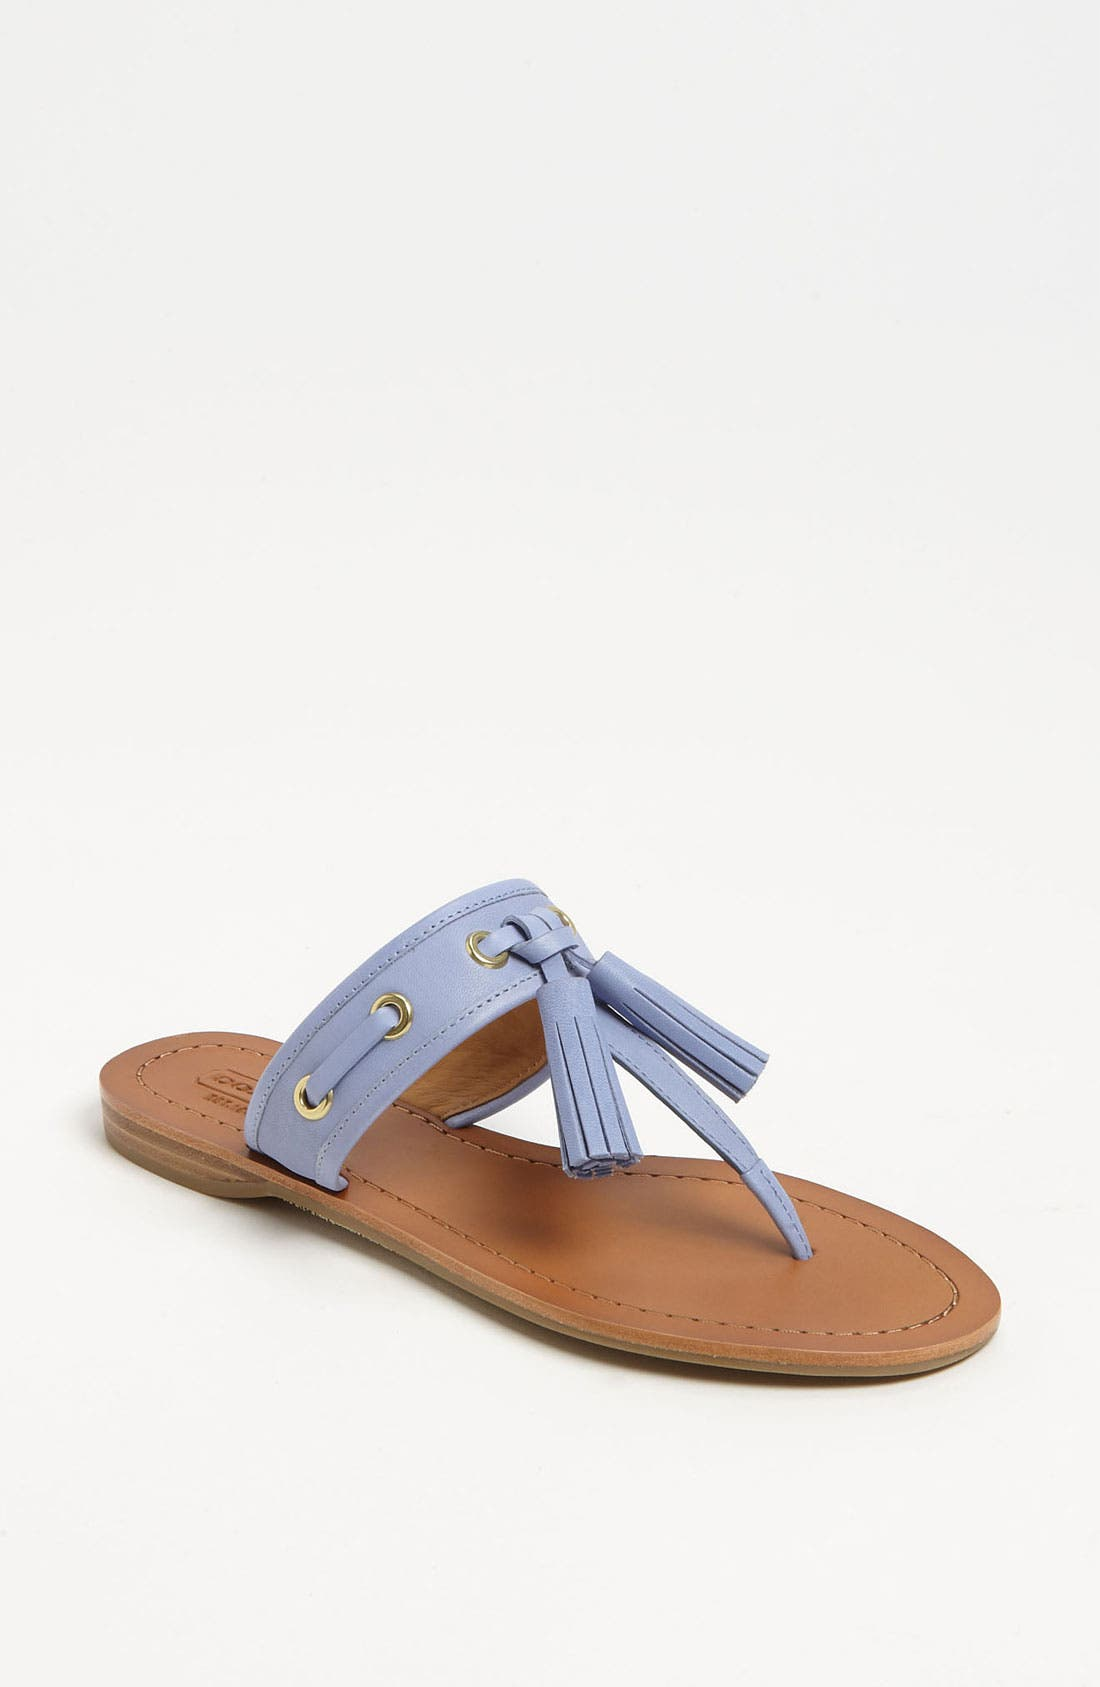 Alternate Image 1 Selected - COACH 'Sheena' Sandal